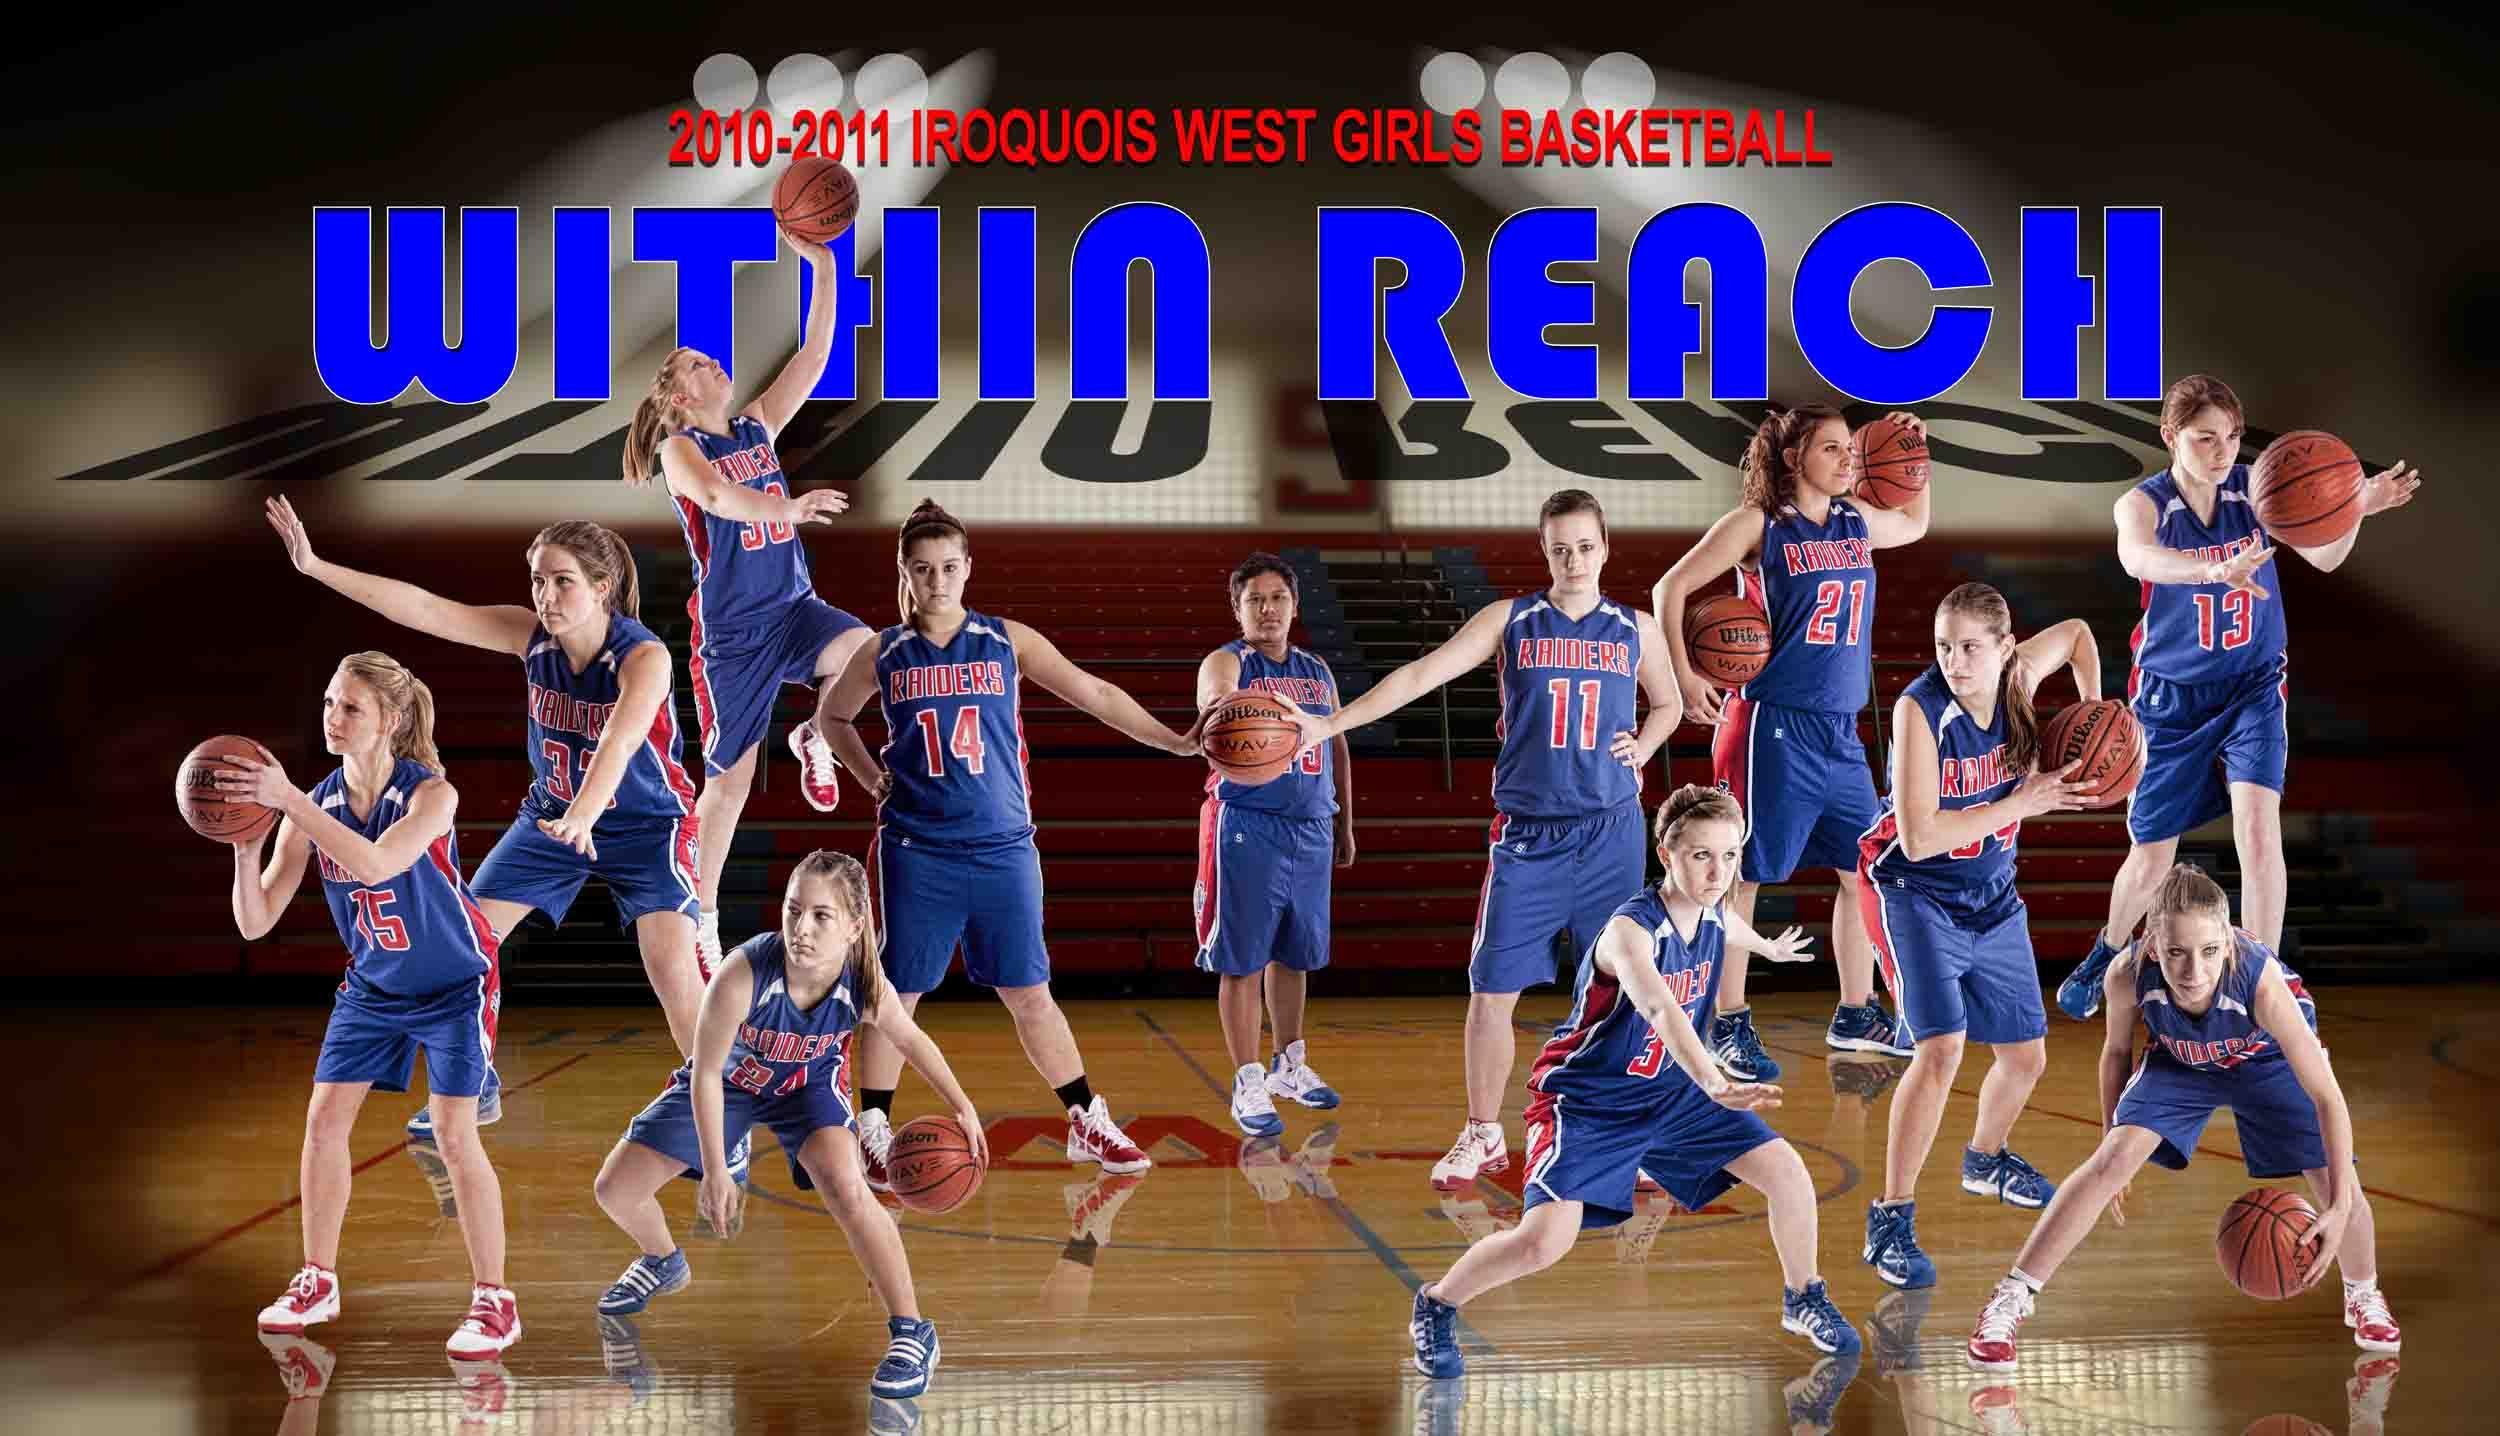 Basketball Team Photo Ideas High School Basketball Poster Ideas Http Www Iwest K12 Il U Basketball Posters High School Basketball Posters Basketball Photos